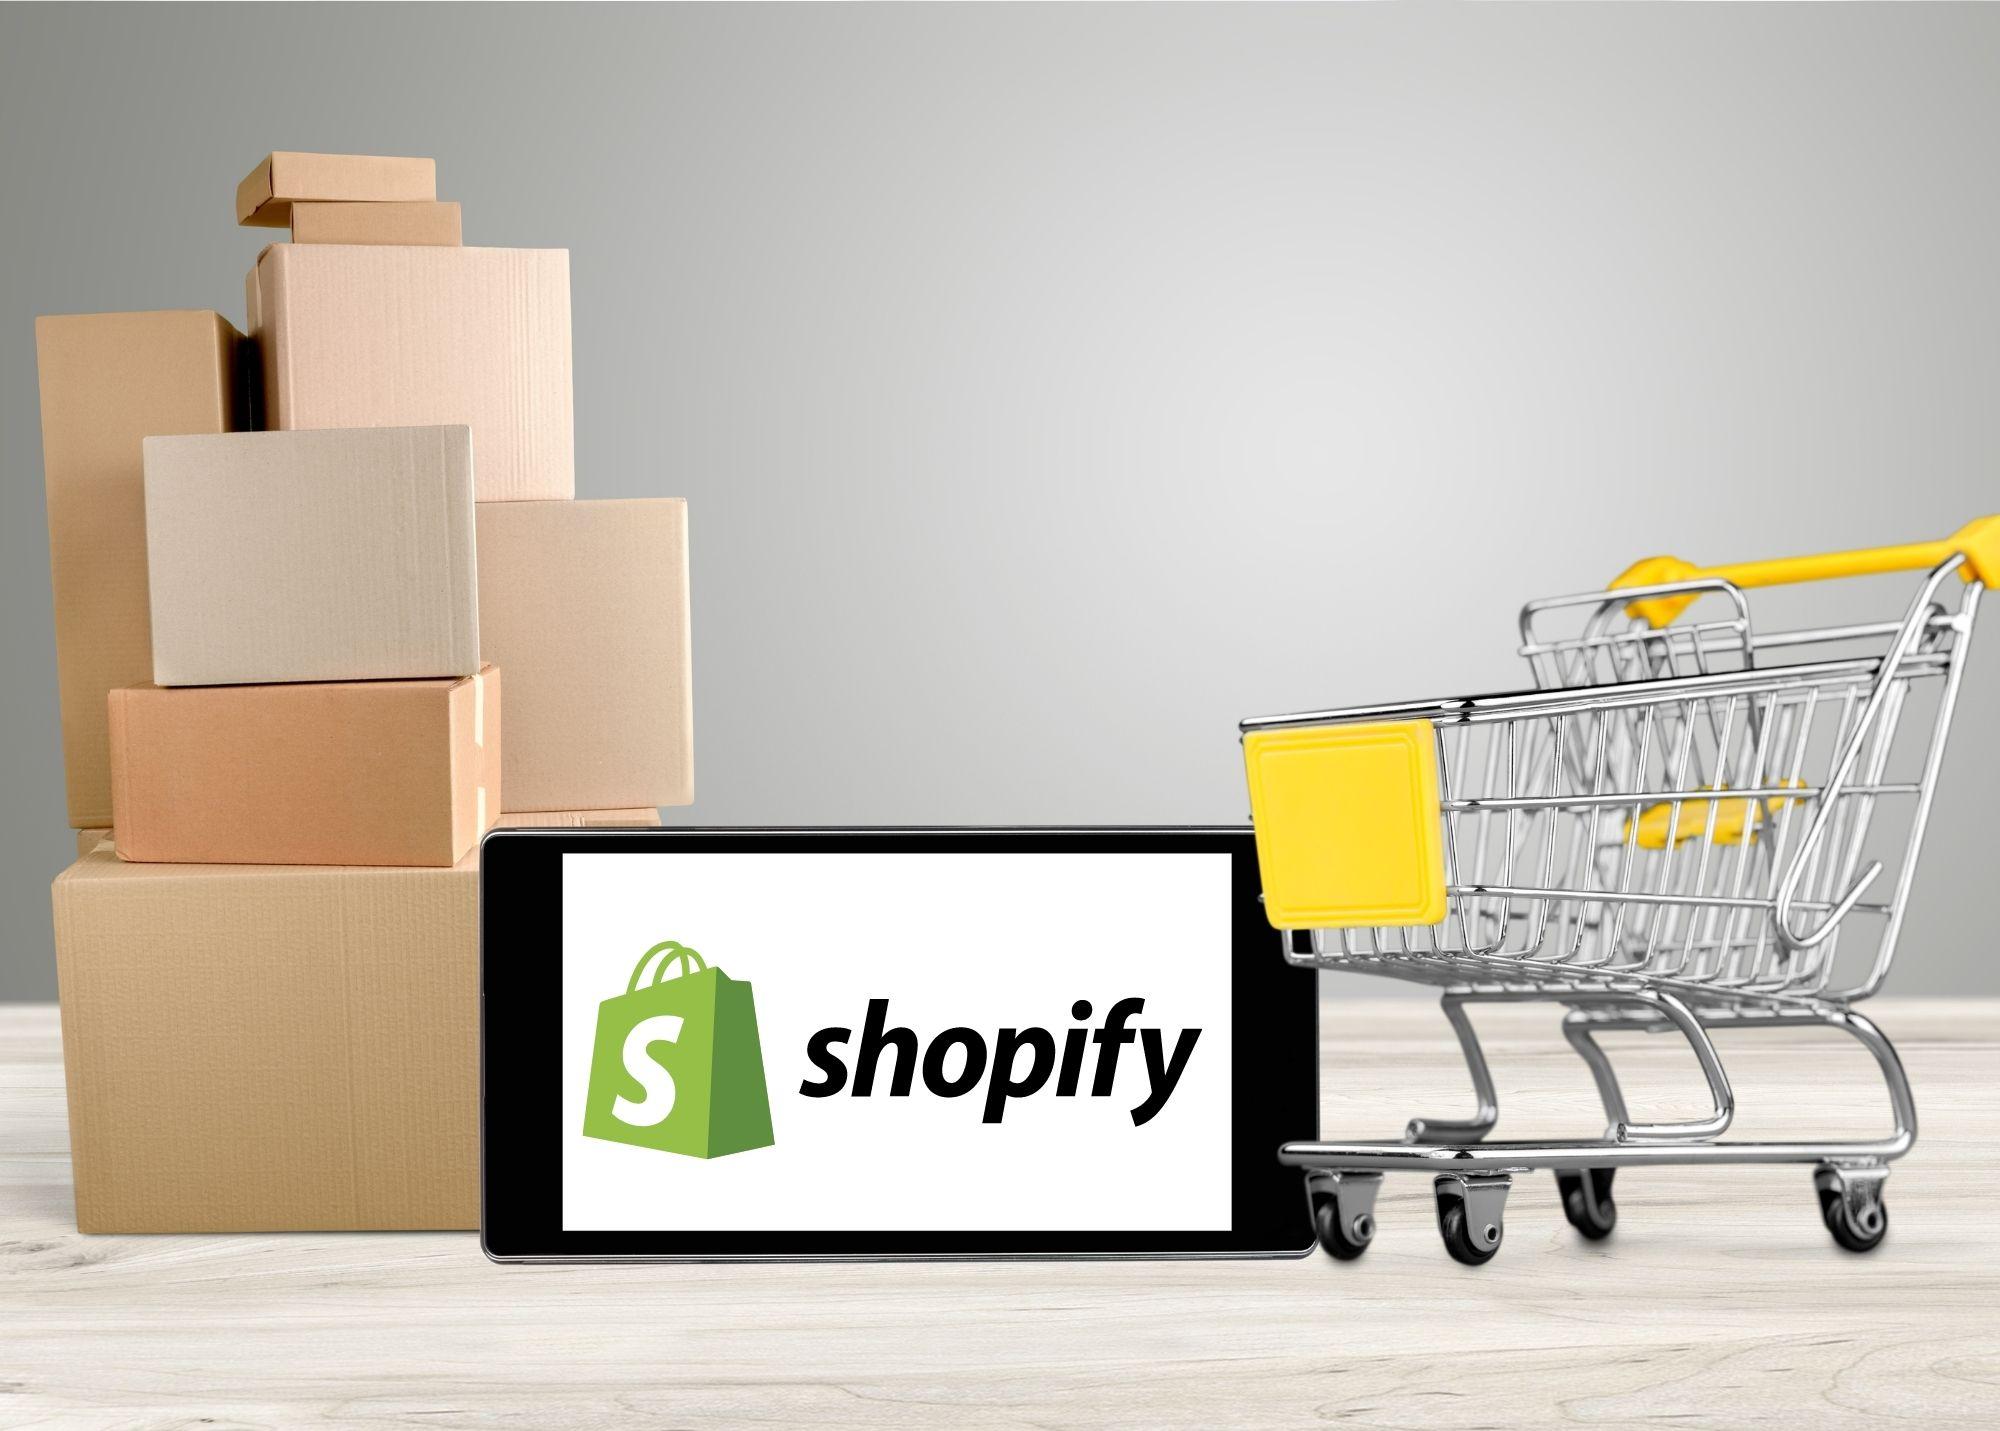 D38 | Shopify Cross-Border Selling FT IMG